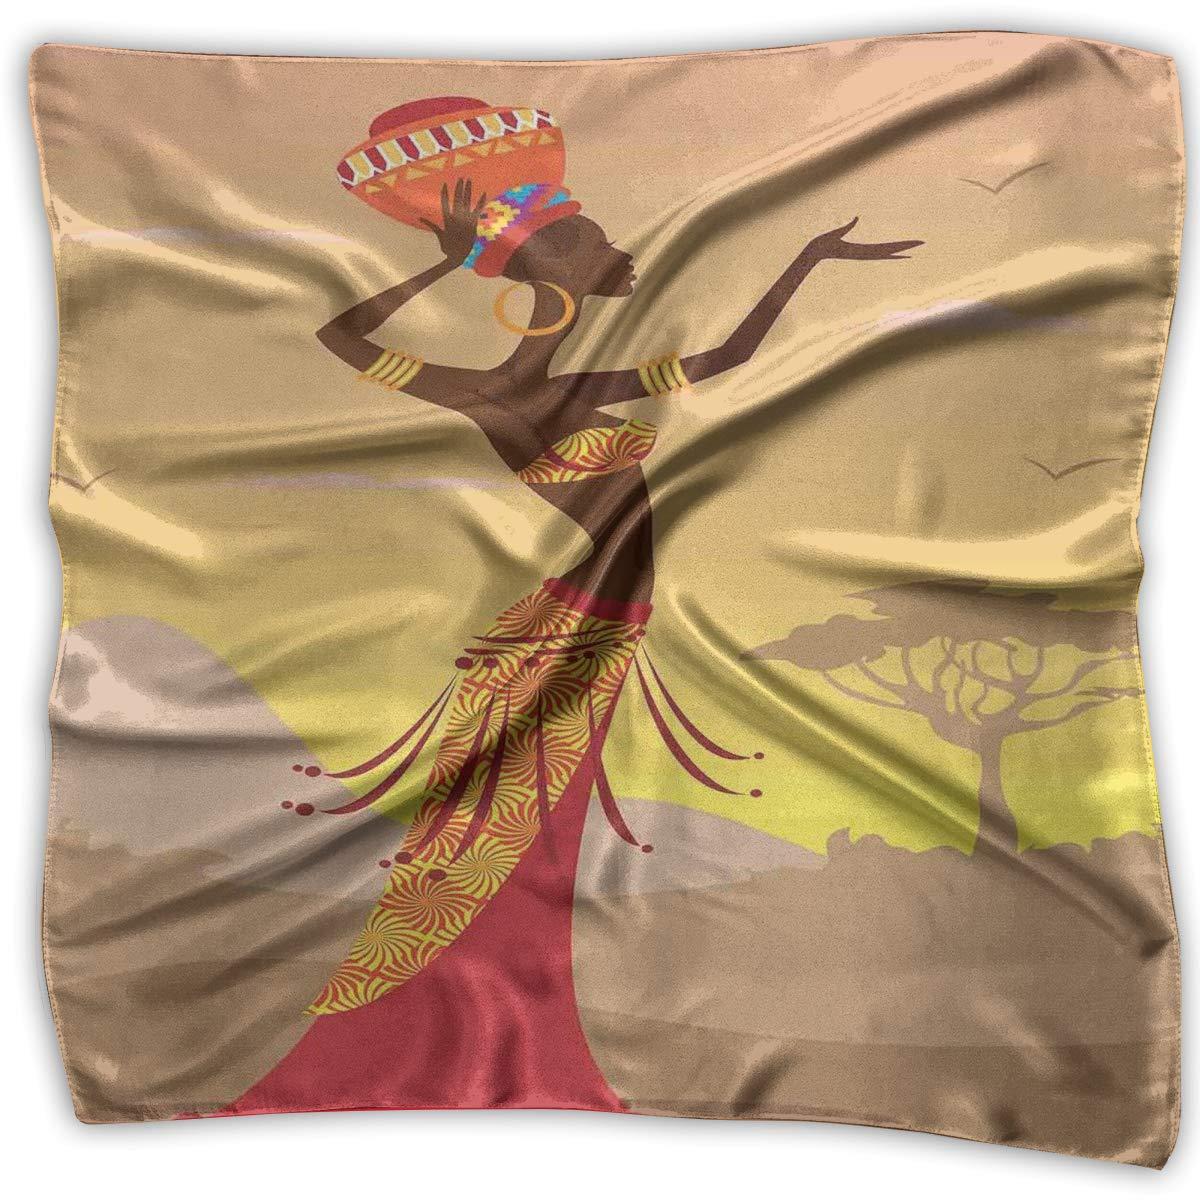 Bandana Head and Neck Tie Neckerchief,African Woman In Desert With Gulls Flying Around Folk Female Stylish Artful Print Theme,Headband